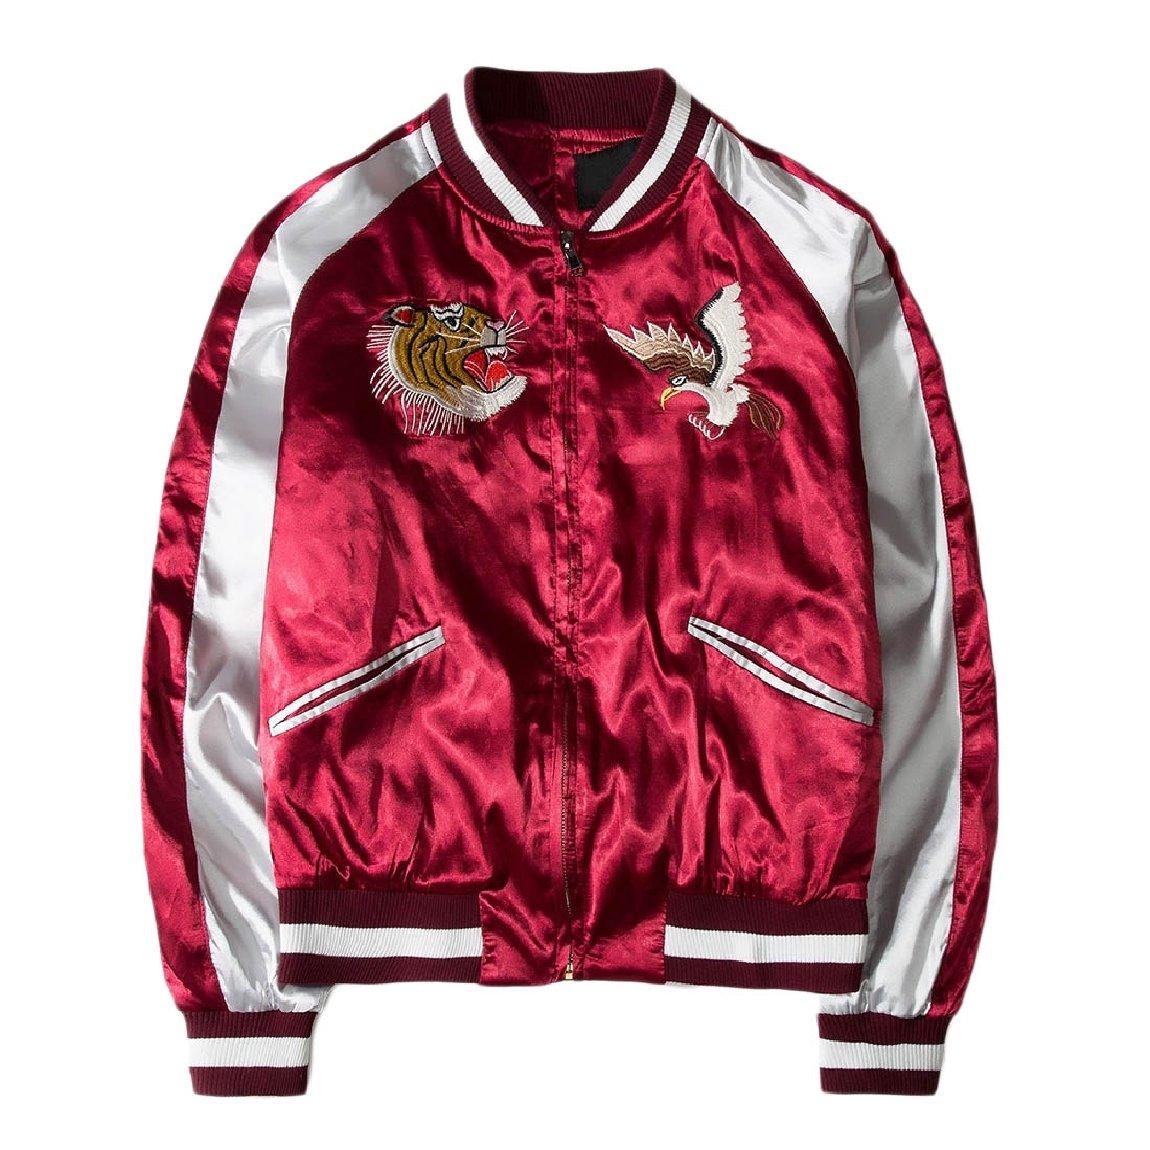 Vska Men Vintage with Zips Embroidery Stylish Satin Punk Rock Coats